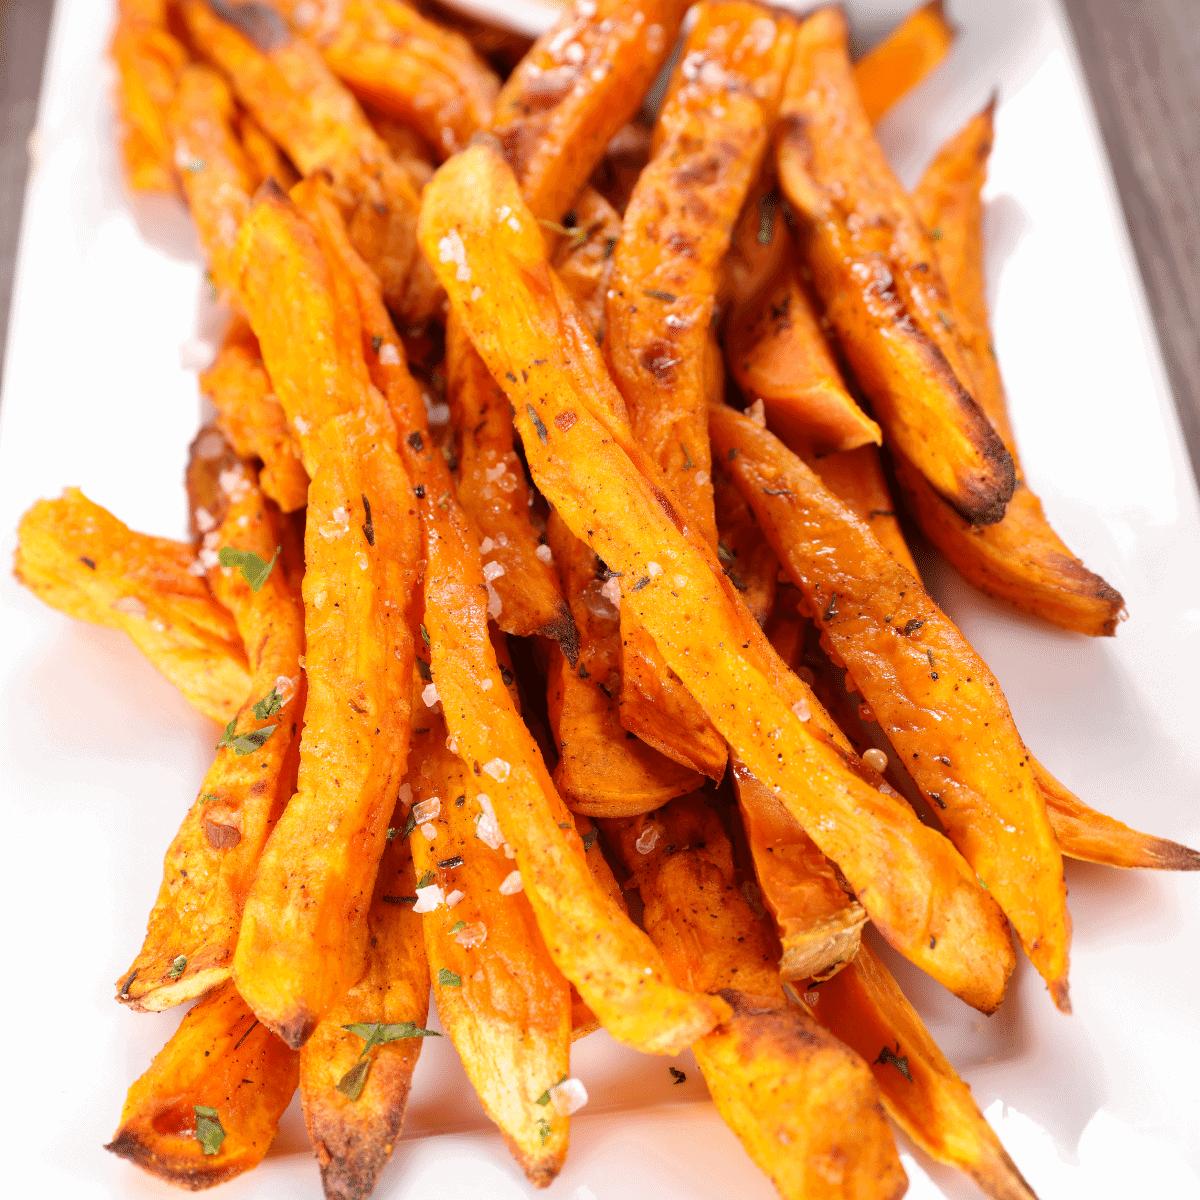 ultra crispy sweet potato fries on a white plate sprinkled with sea salt